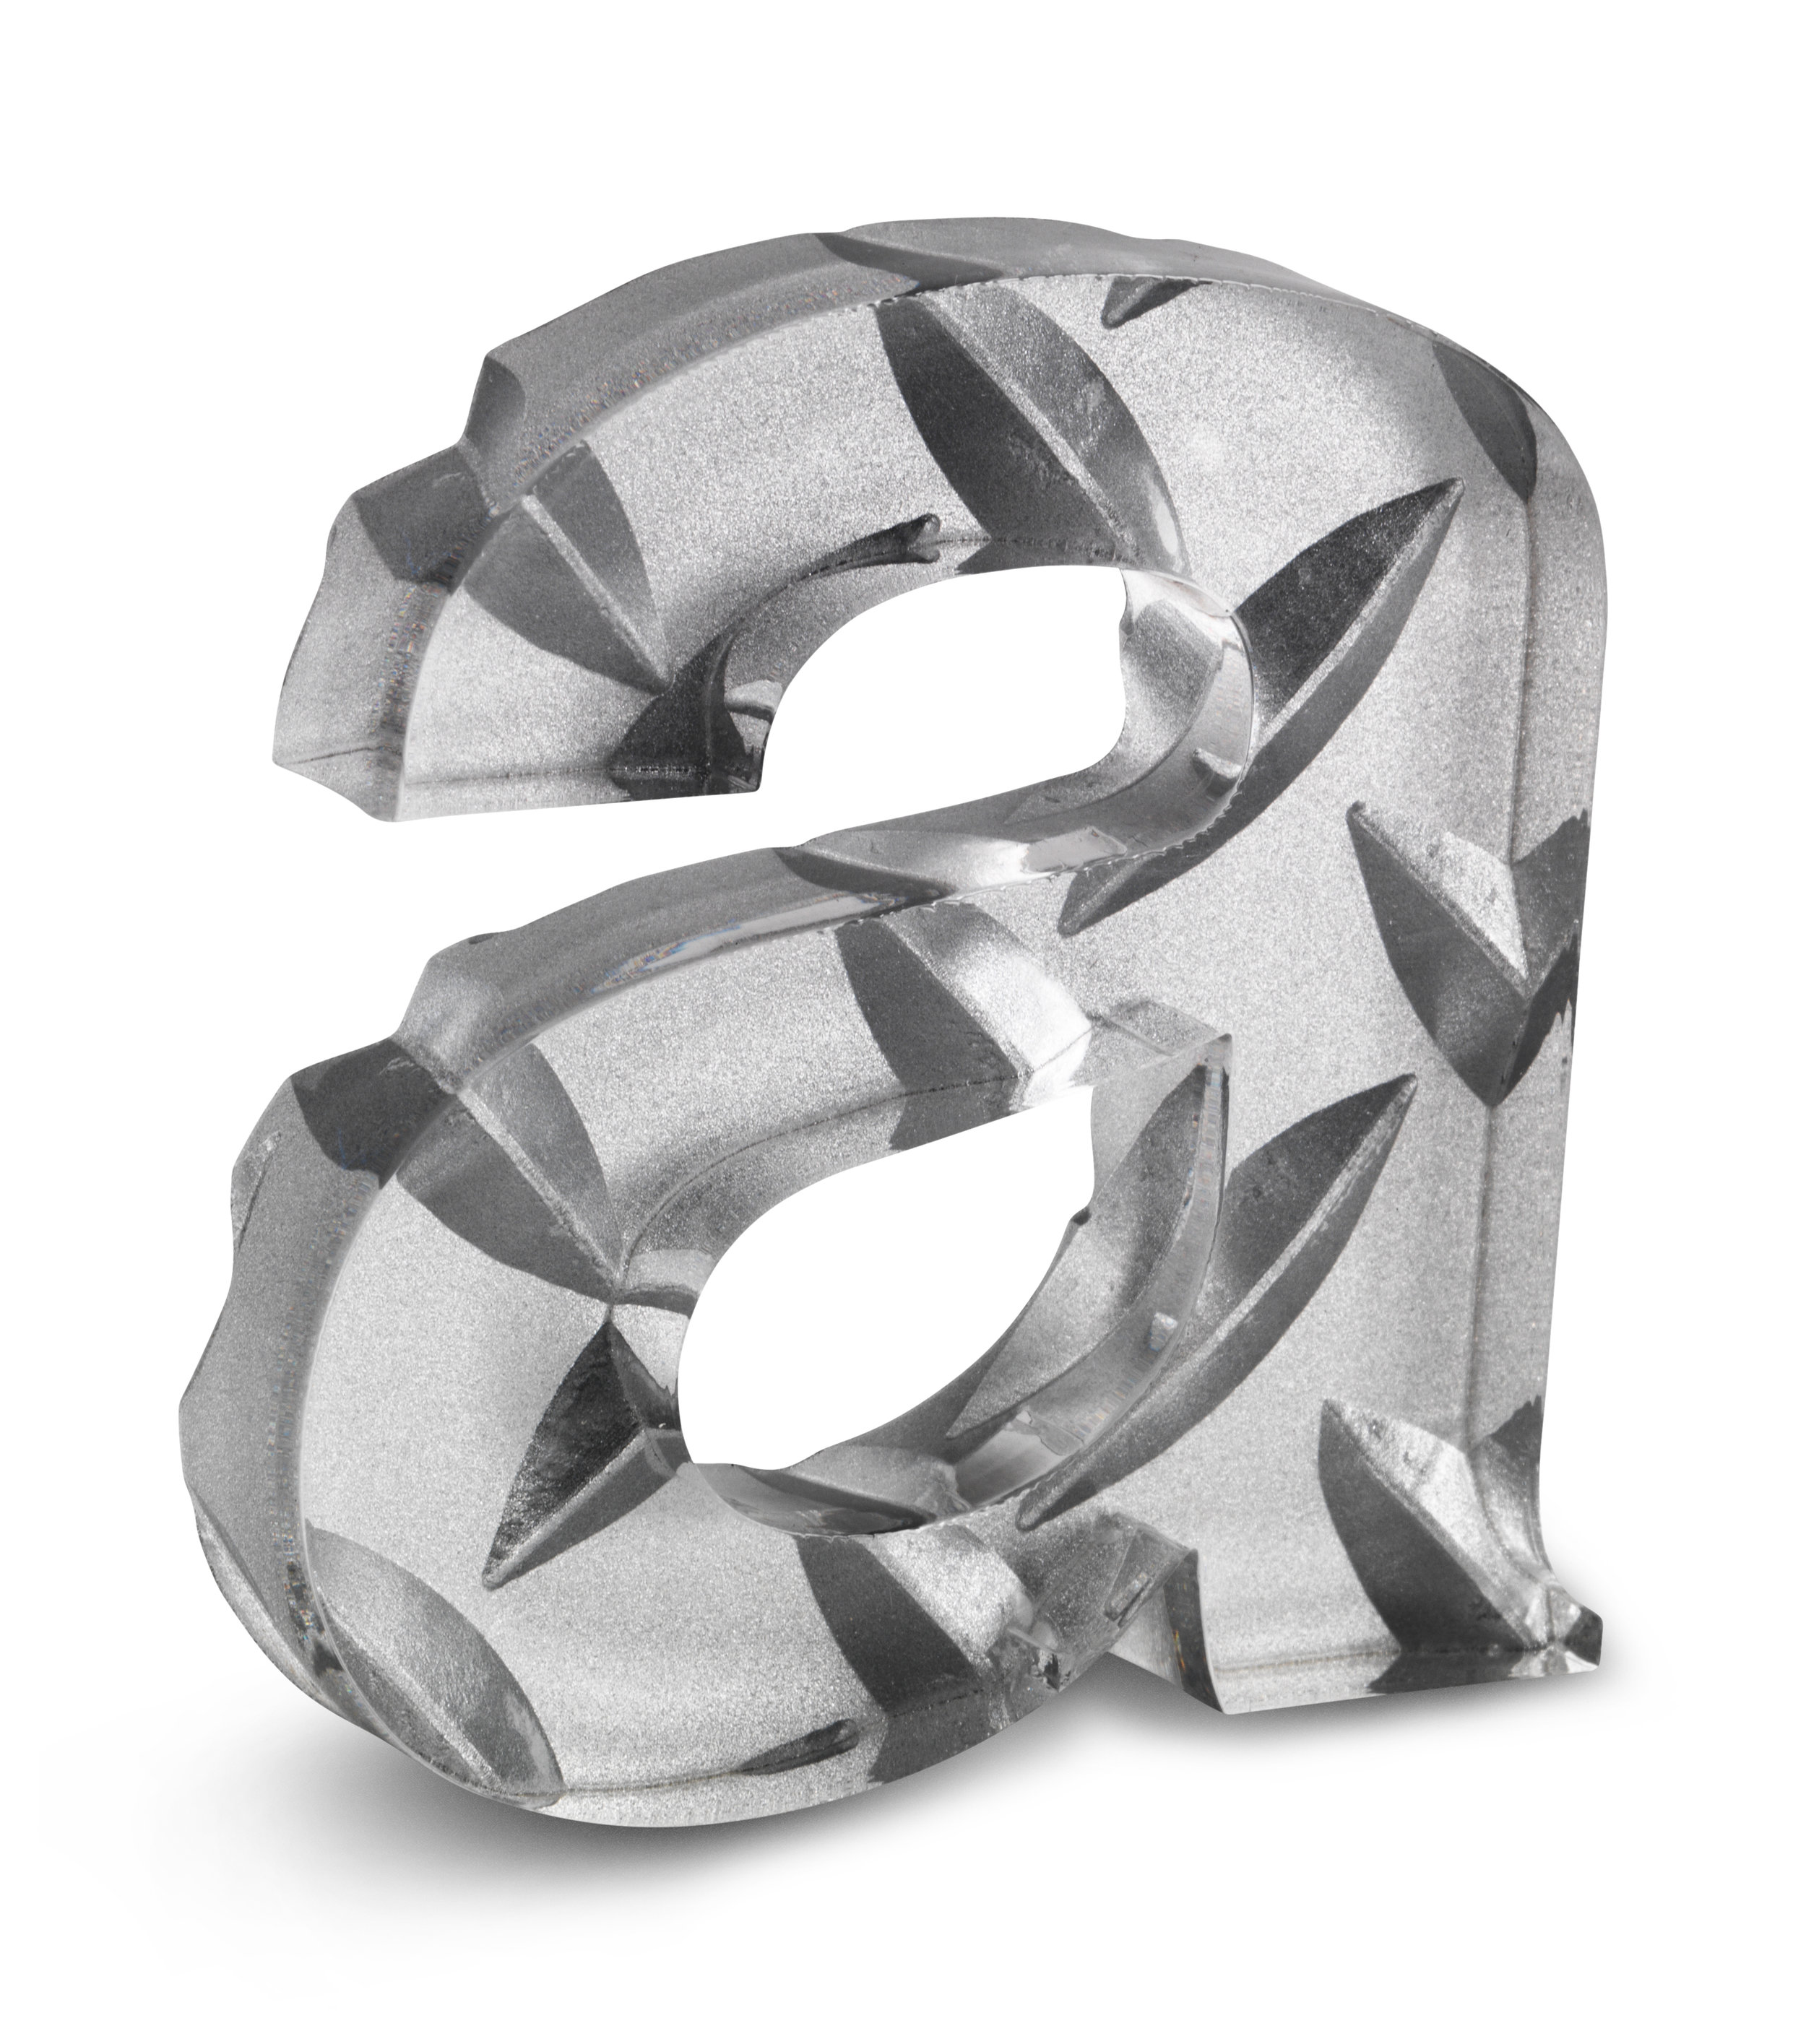 Acrytex Diamond Plate